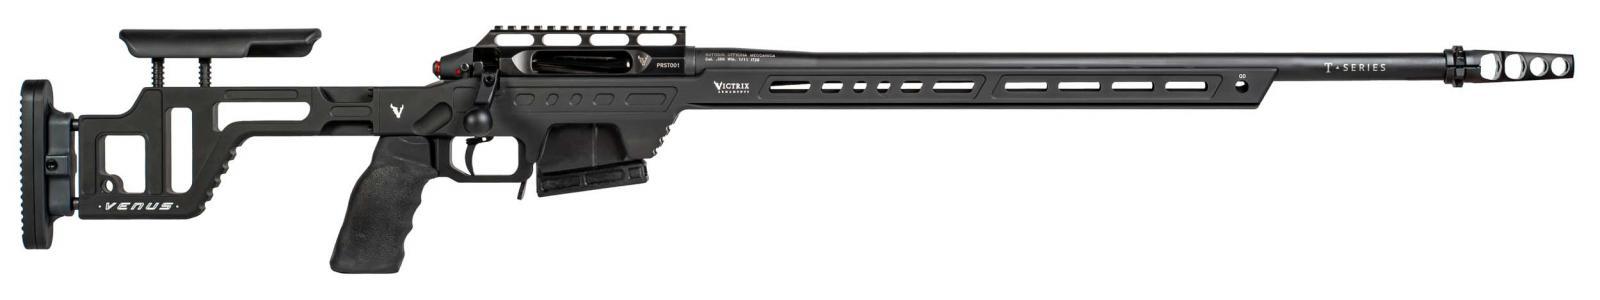 Carabine VICTRIX VENUS T